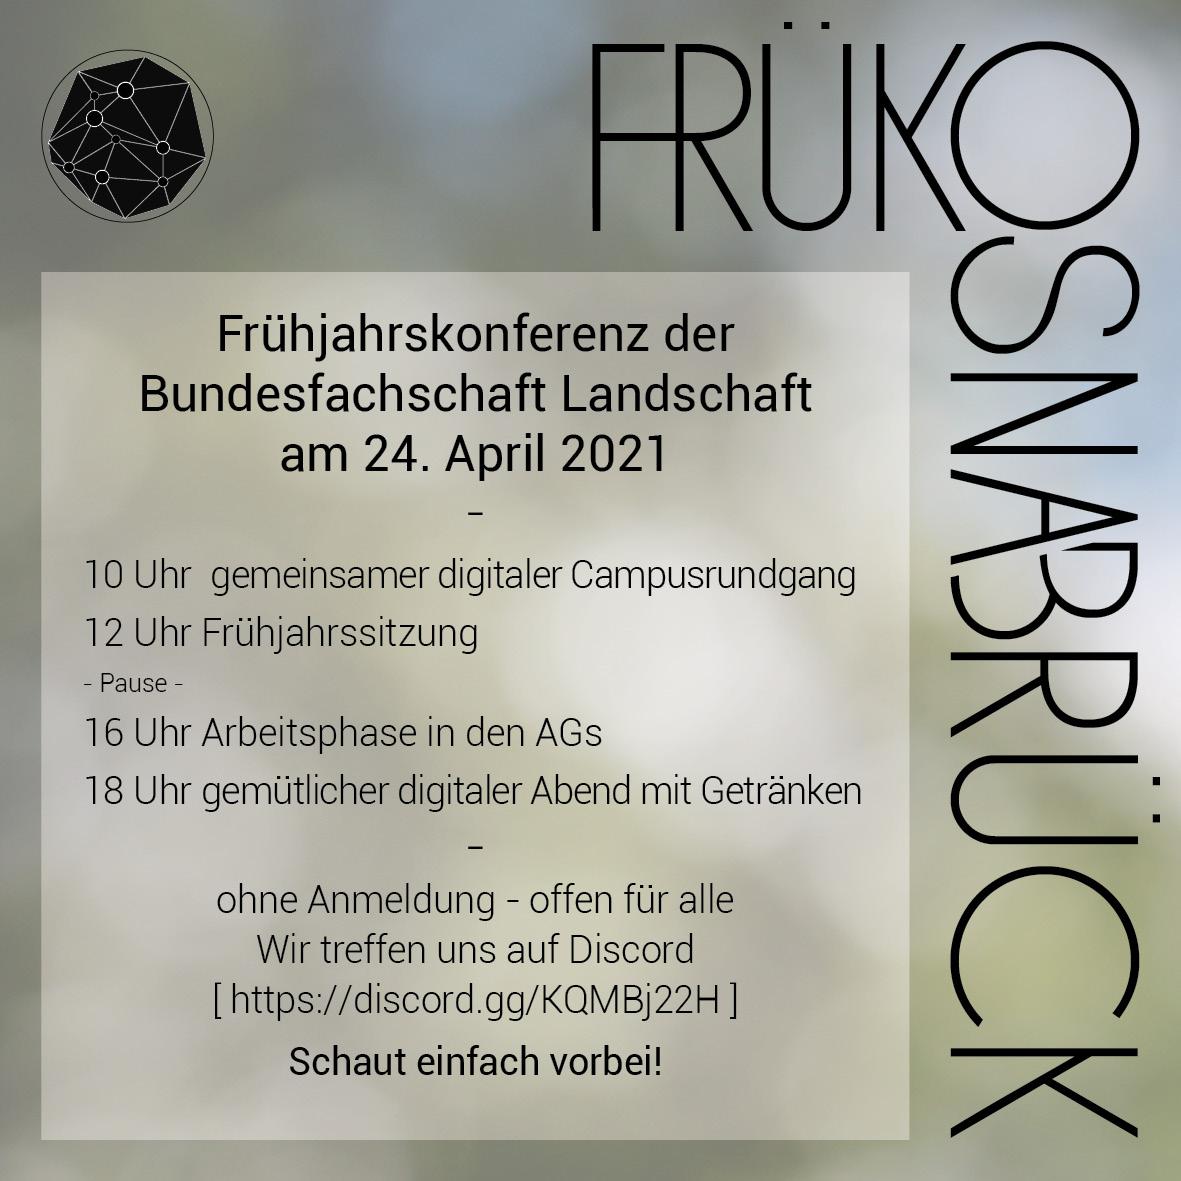 Früko Osnabrück Sharepic3